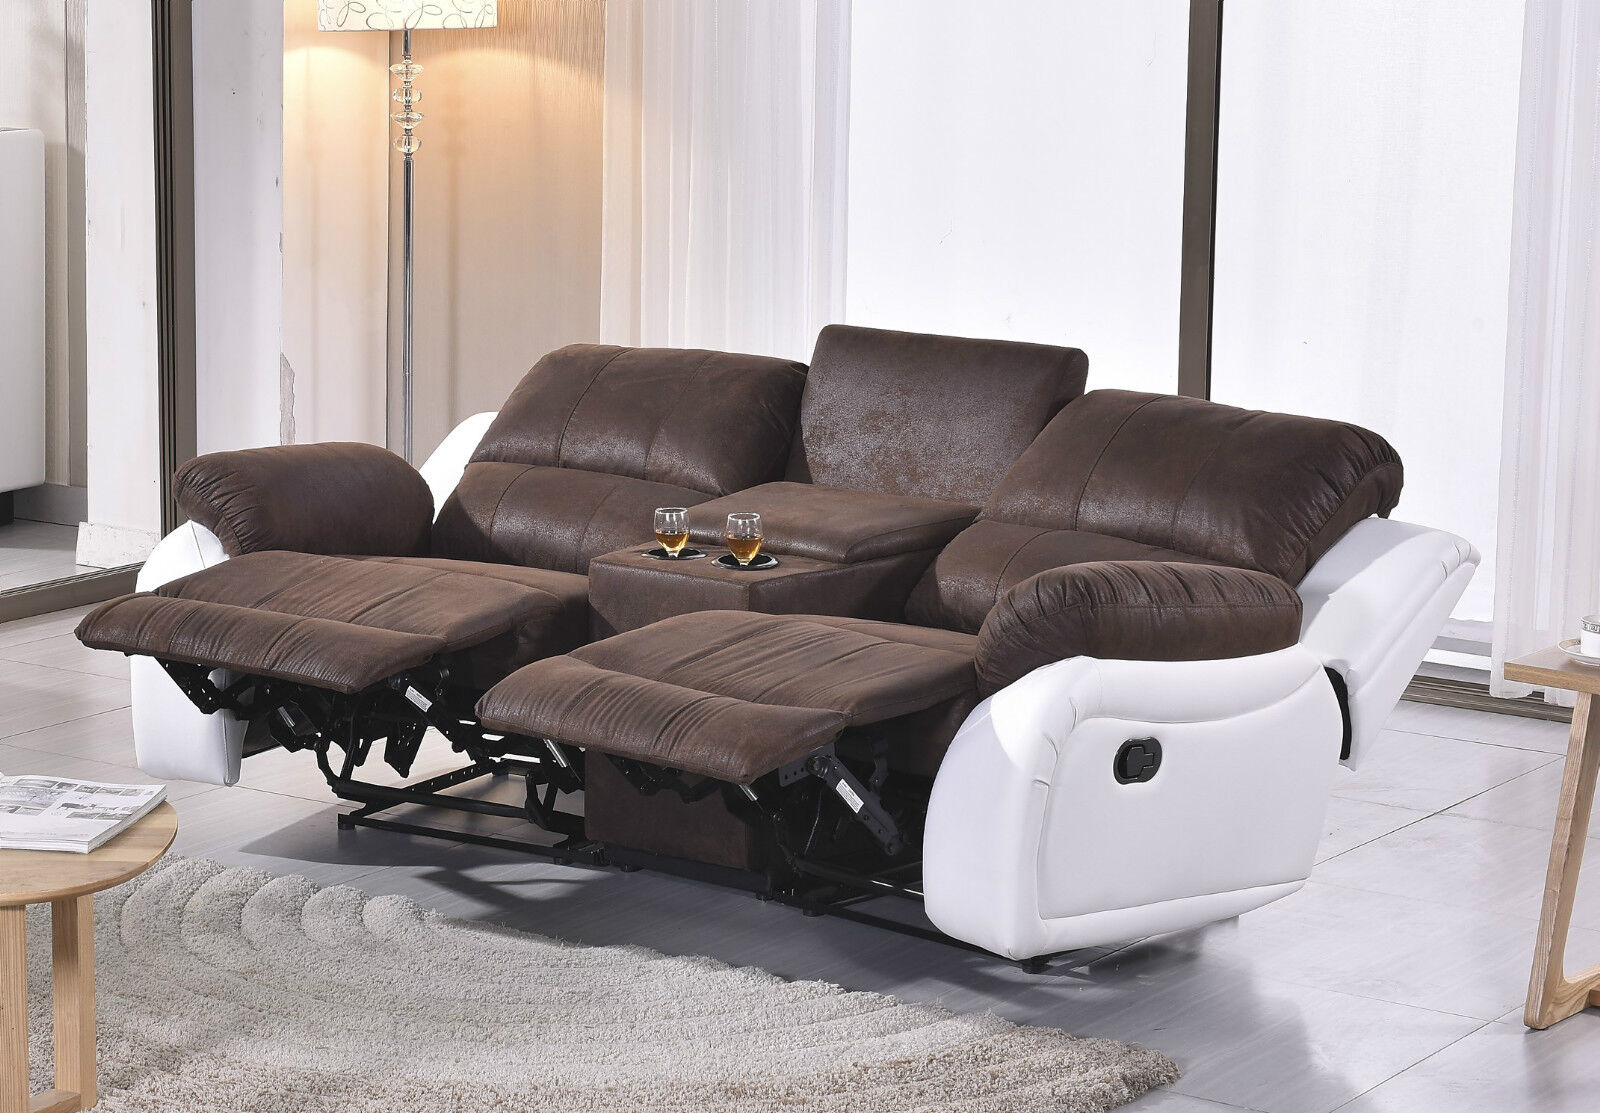 mikrofaser sofa kinosofa relaxcouch fernsehsofa heimkino. Black Bedroom Furniture Sets. Home Design Ideas